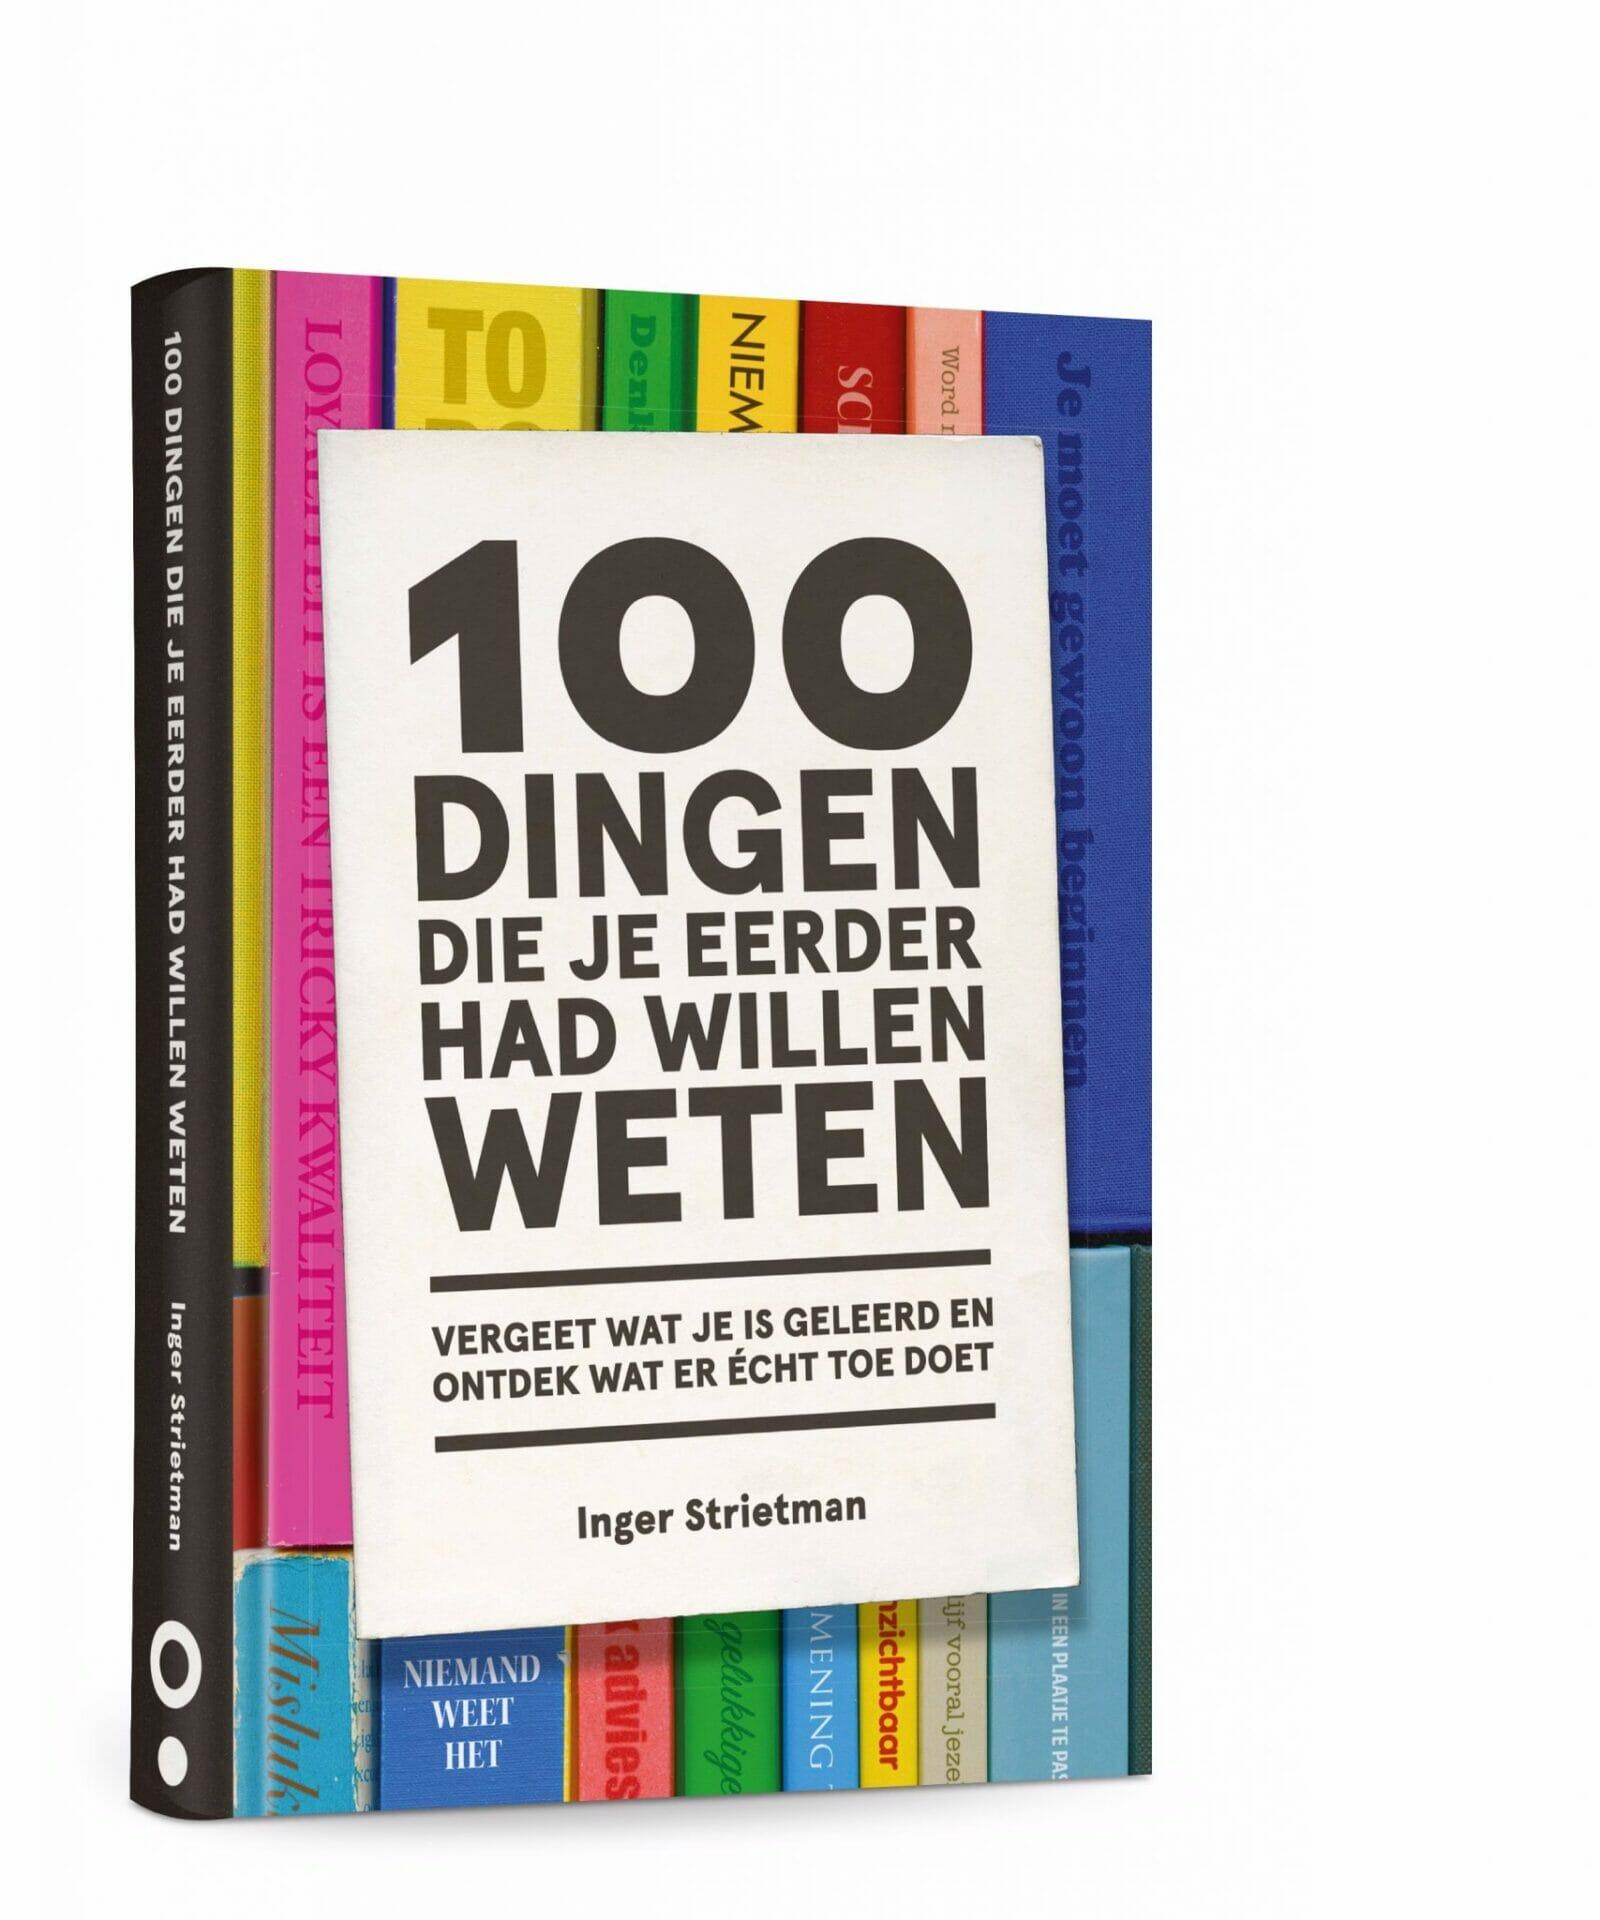 100 dingen review inter strietman